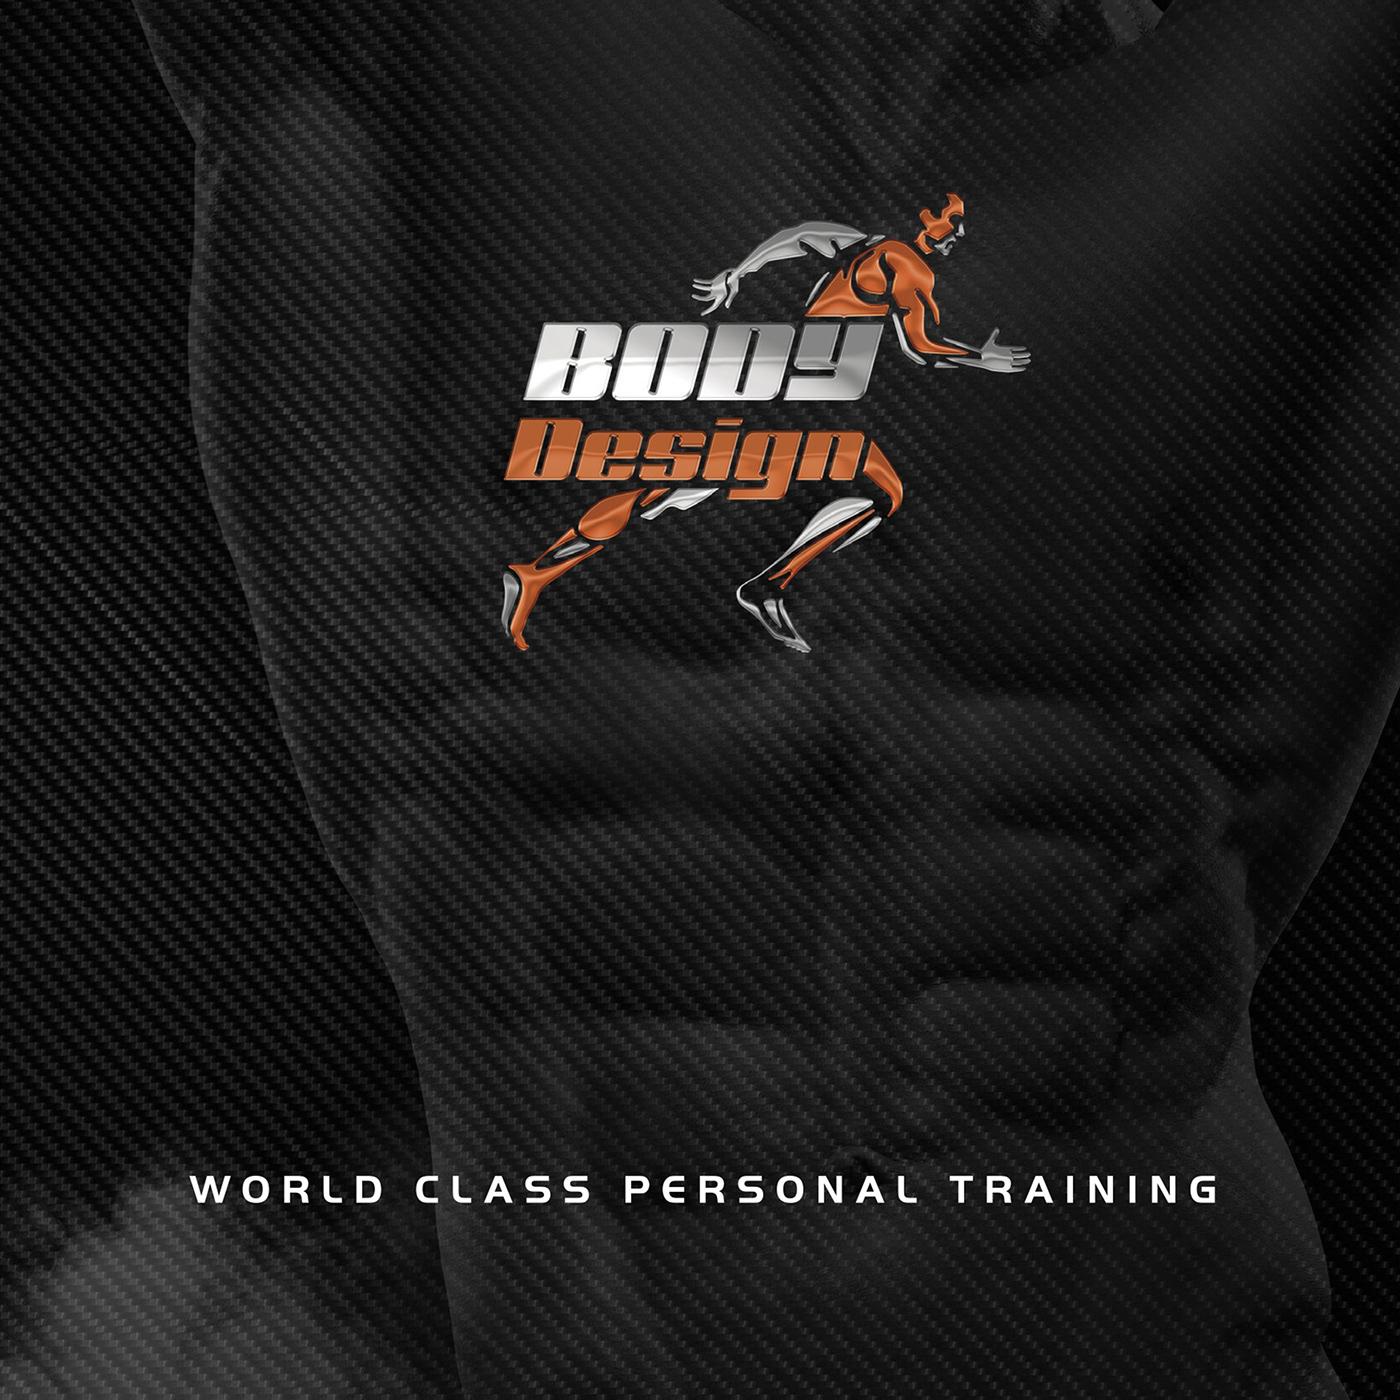 sport logo muscle run luxury Carbon Fiber silver prestige trainer Fitnes club